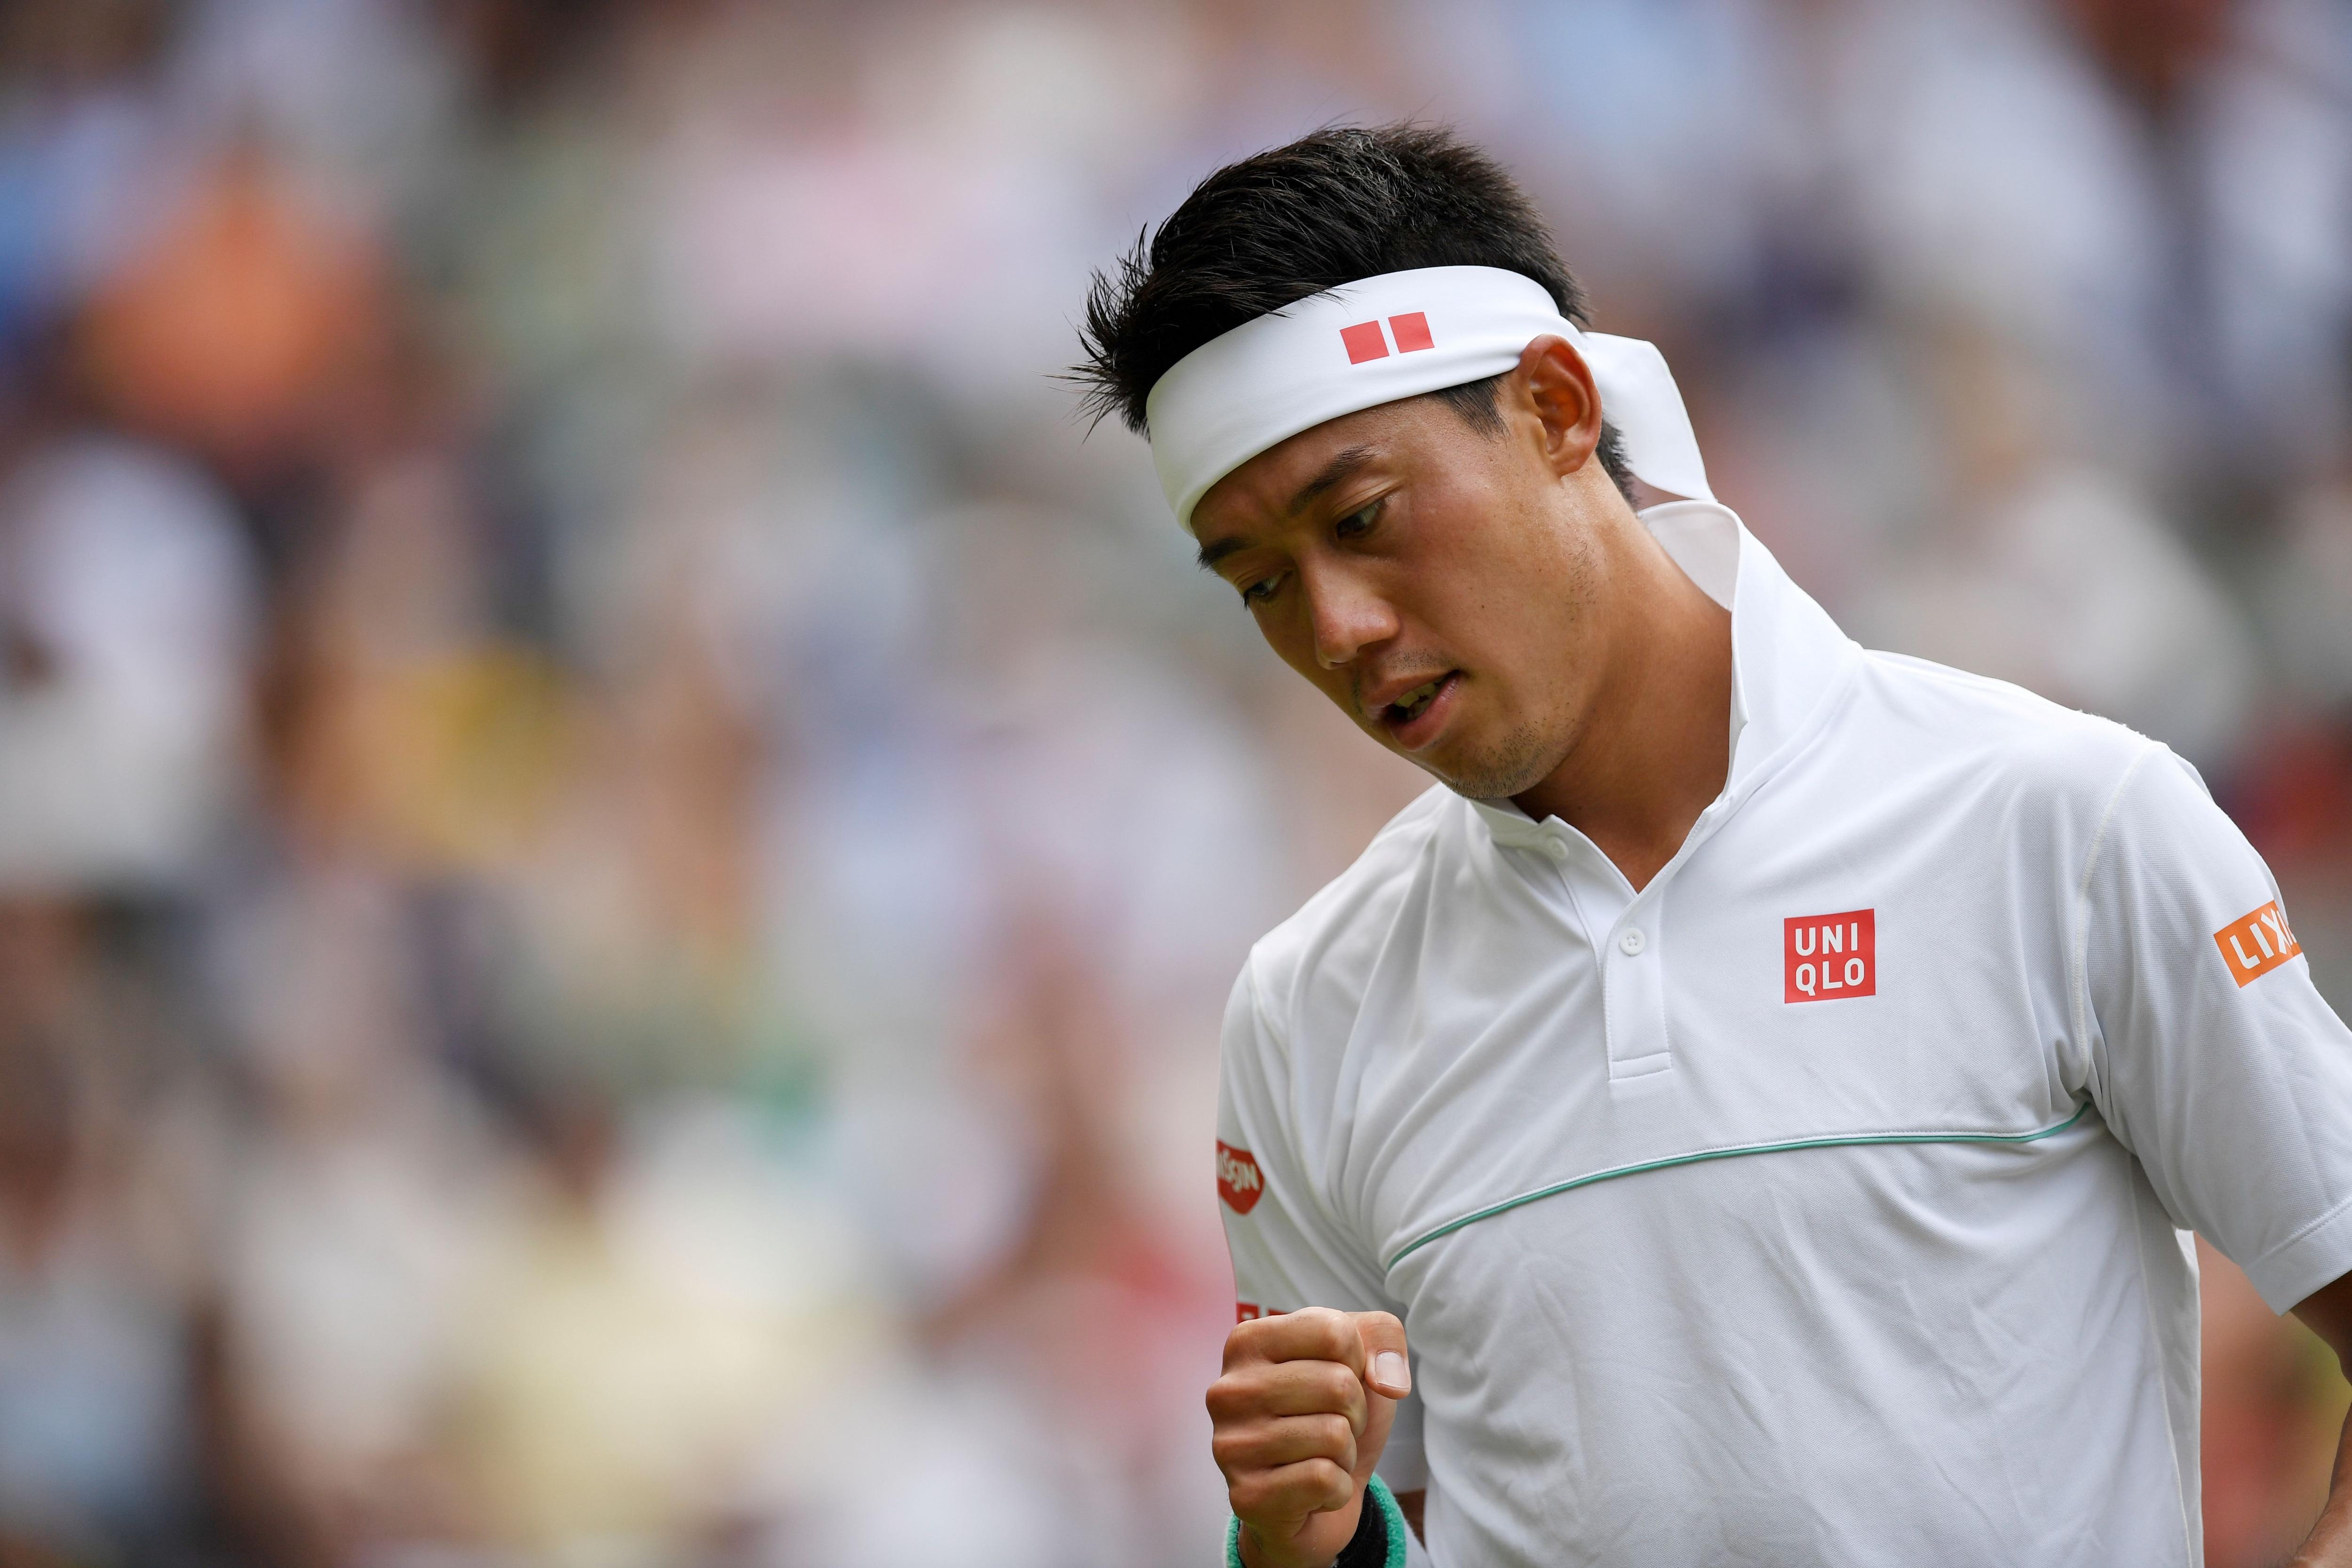 Kei Nishikori quiere llegar al US Open (Reuters)